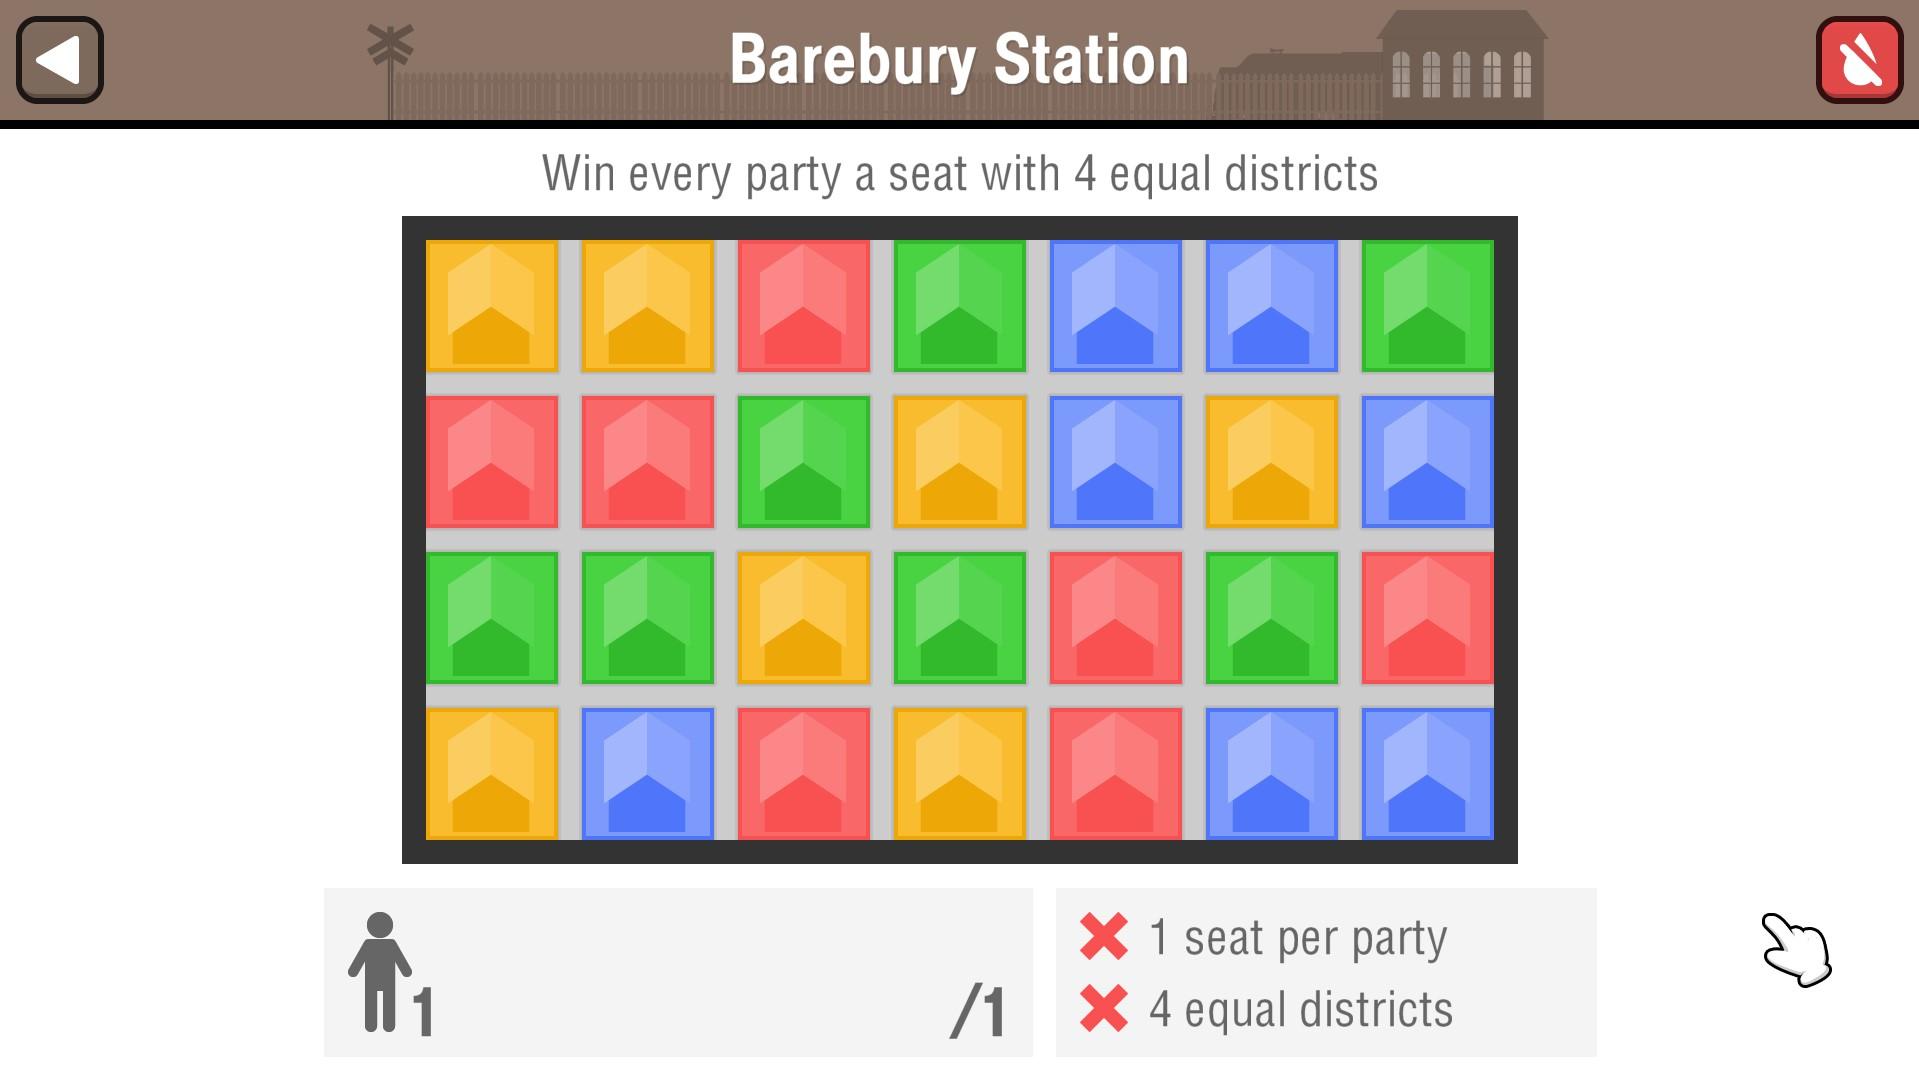 Barebury Station